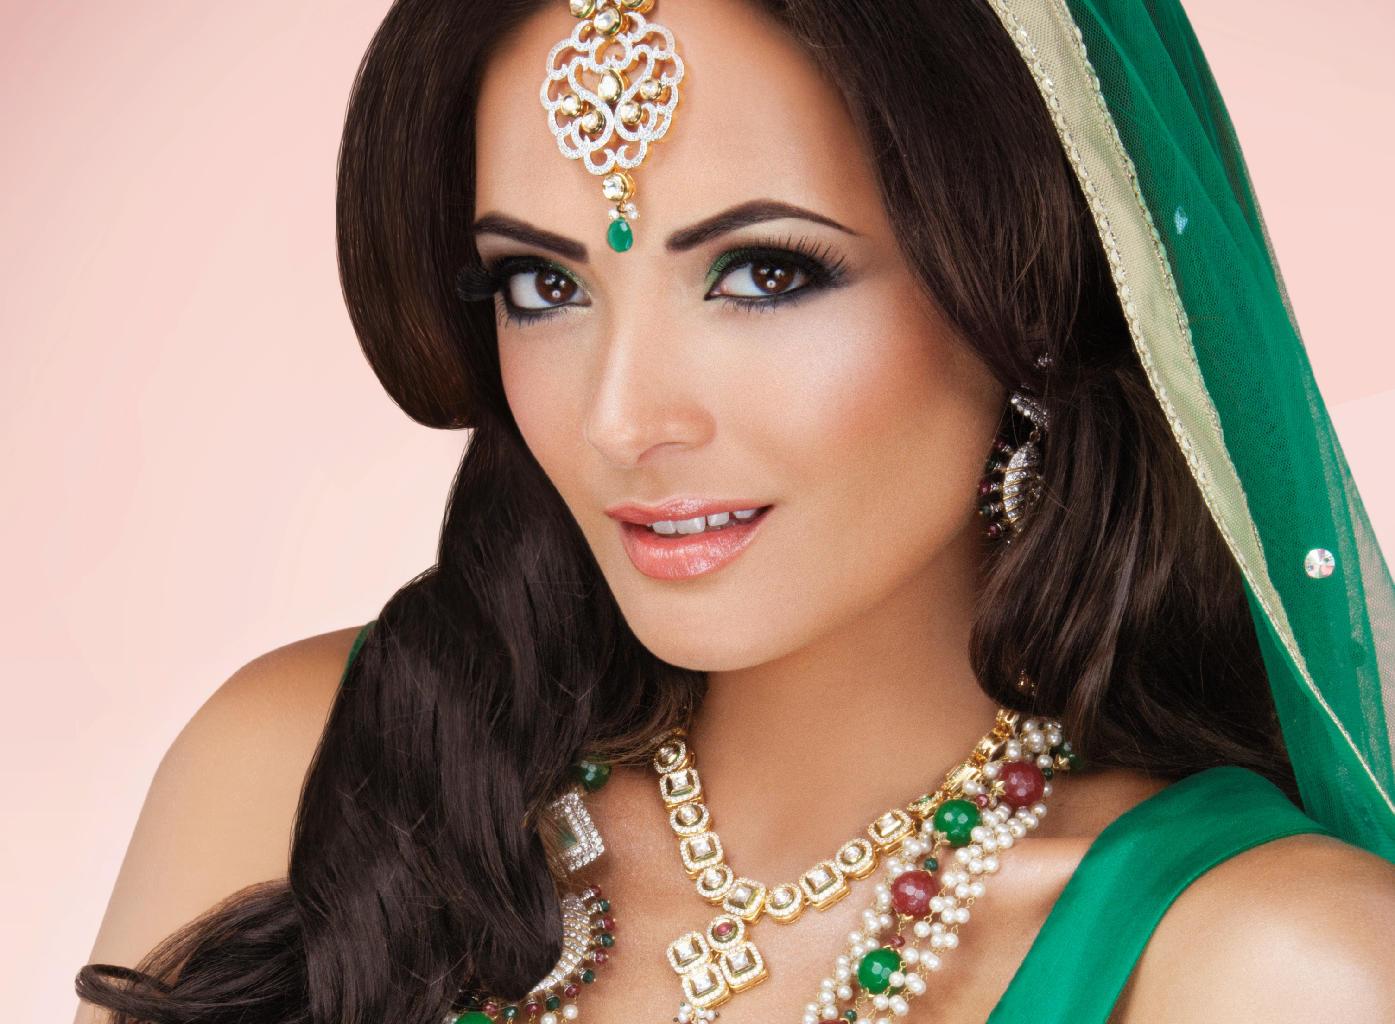 Индийские девушки картинки, пилюли